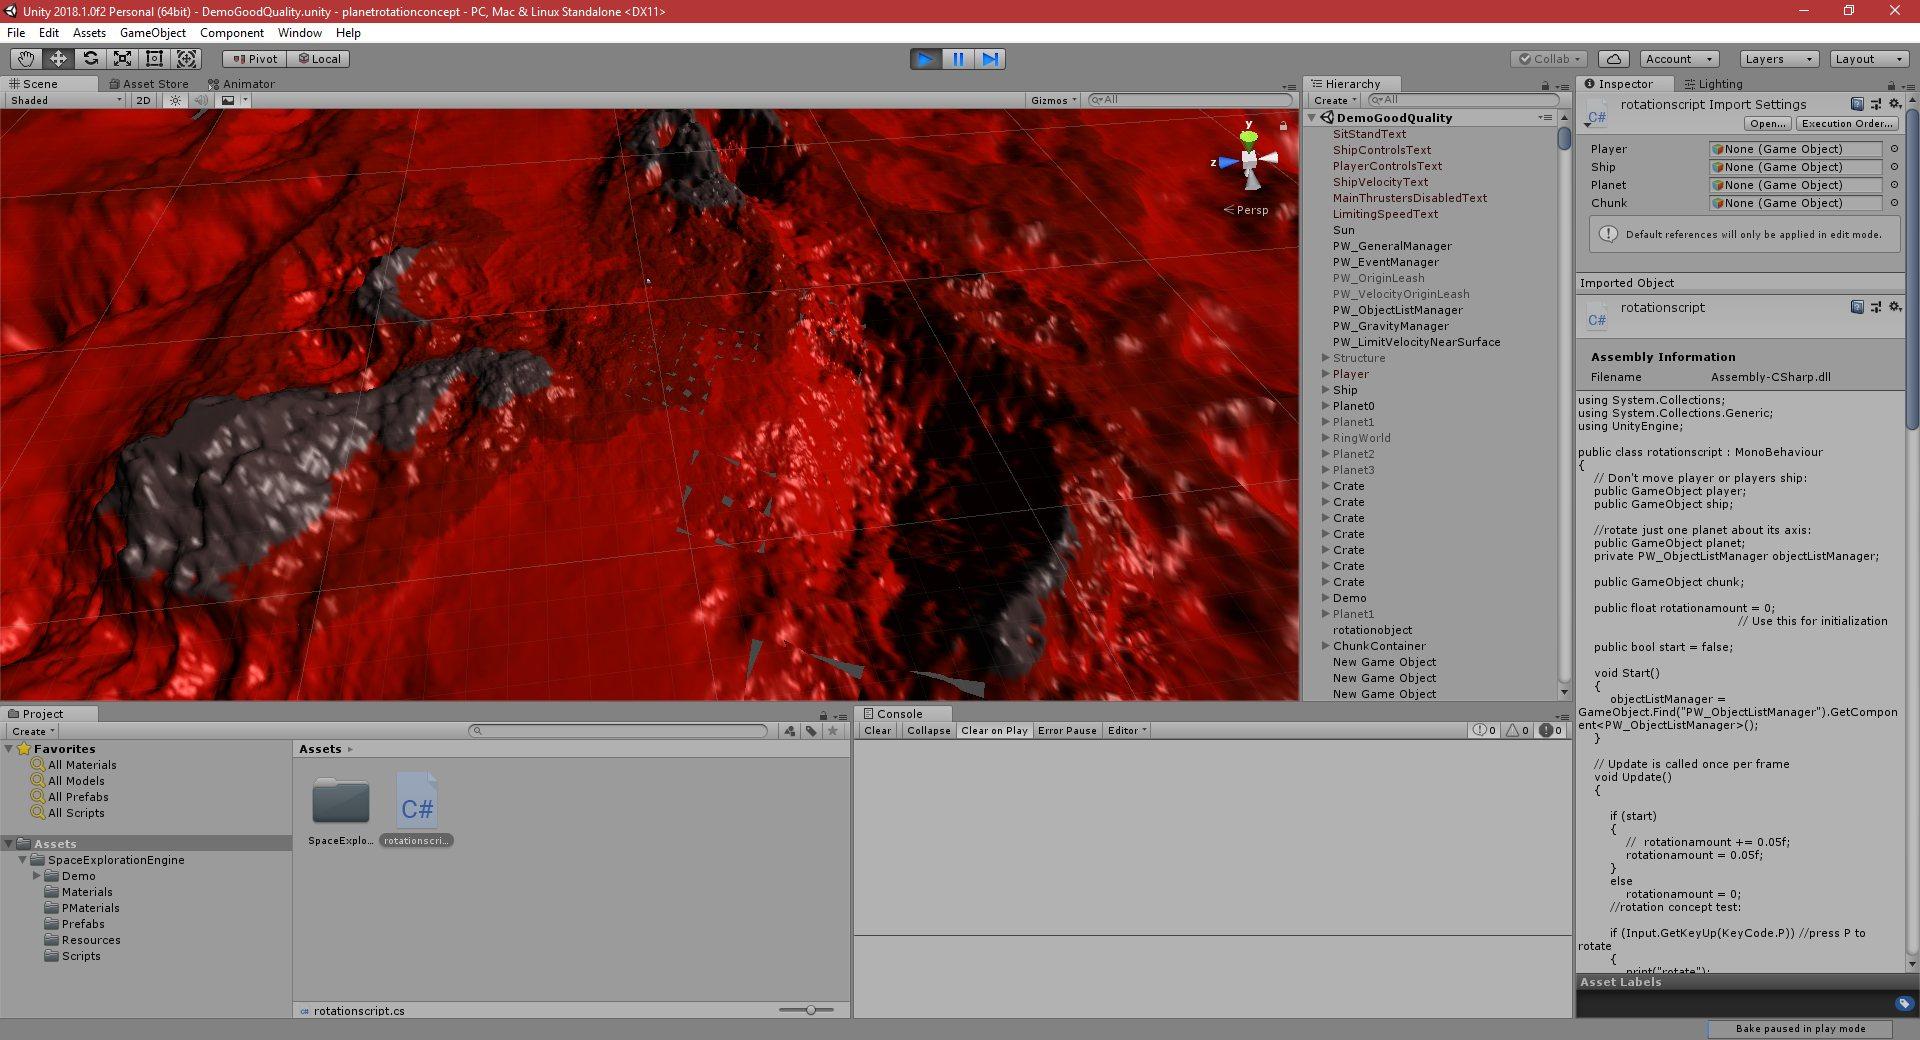 P0-A1: Part 397: Art,Planet Rotation - PGD Home